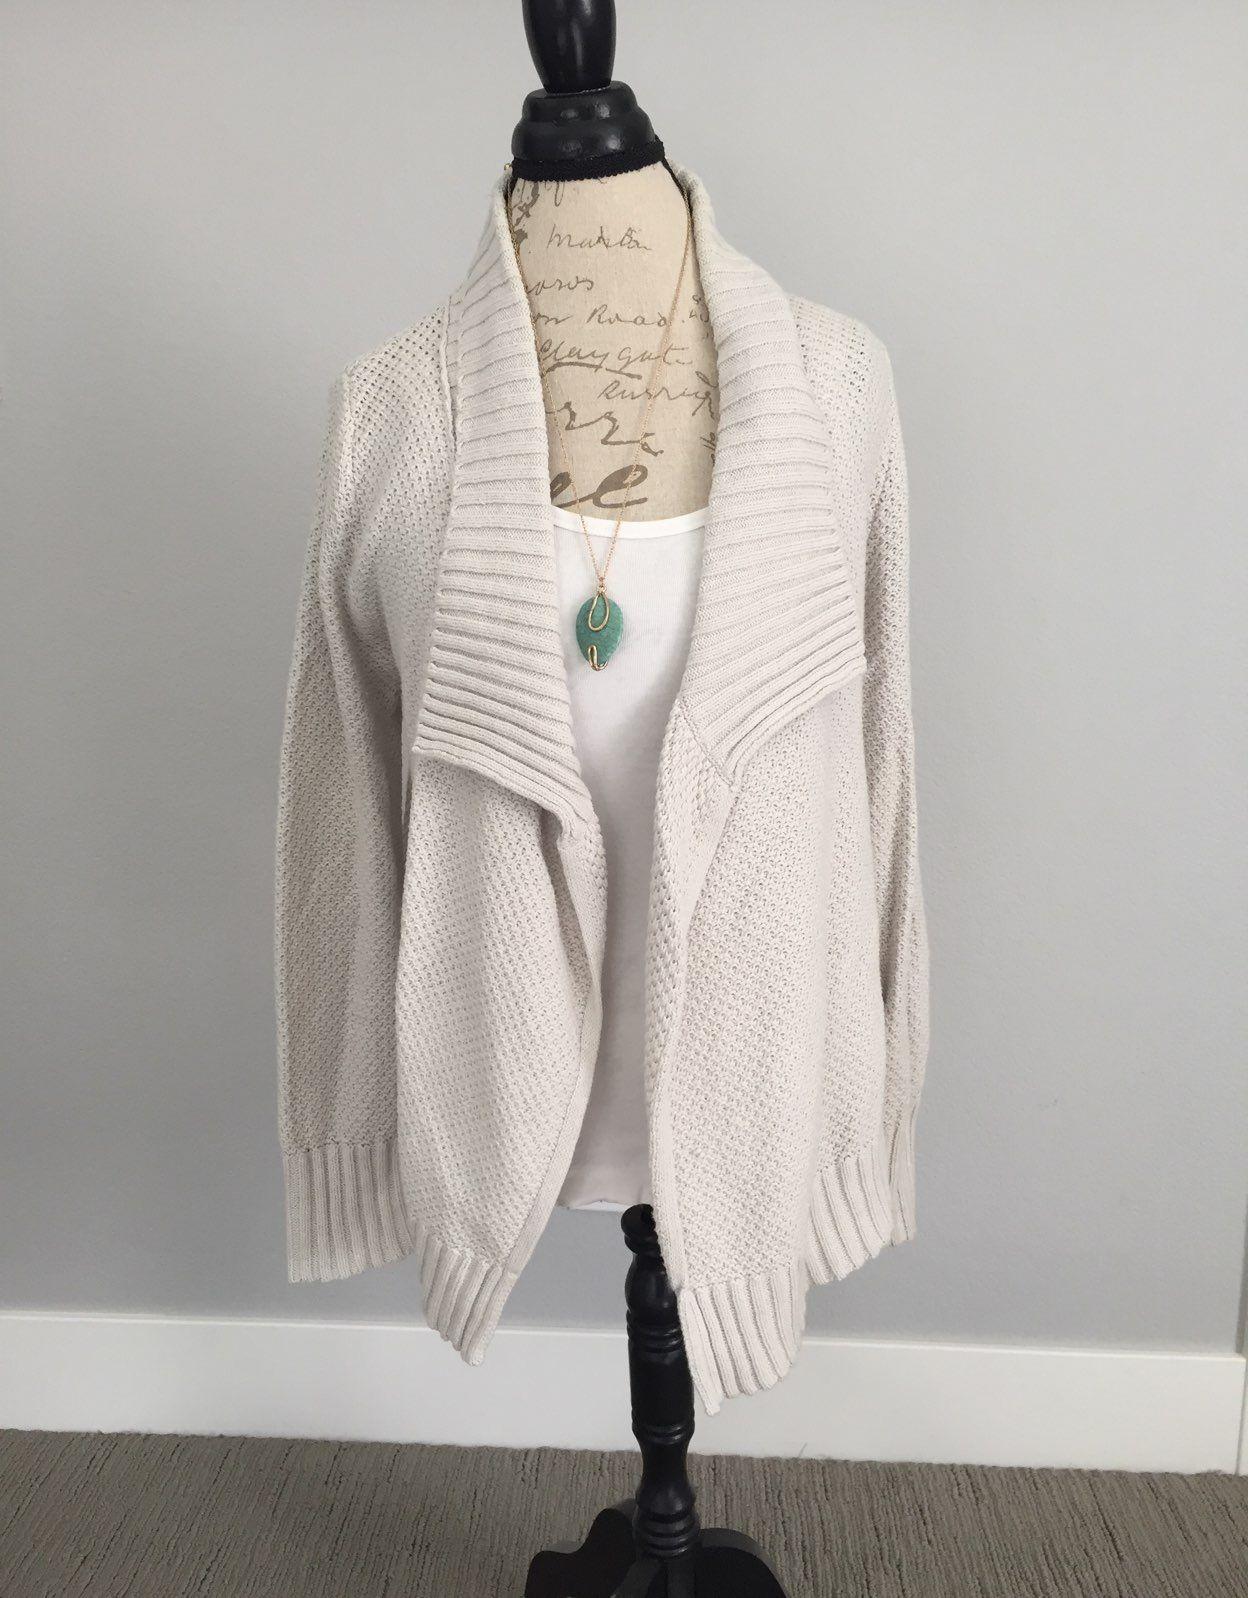 Old Navy Cardigan Sweater, Size Medium - Mercari: BUY & SELL ...